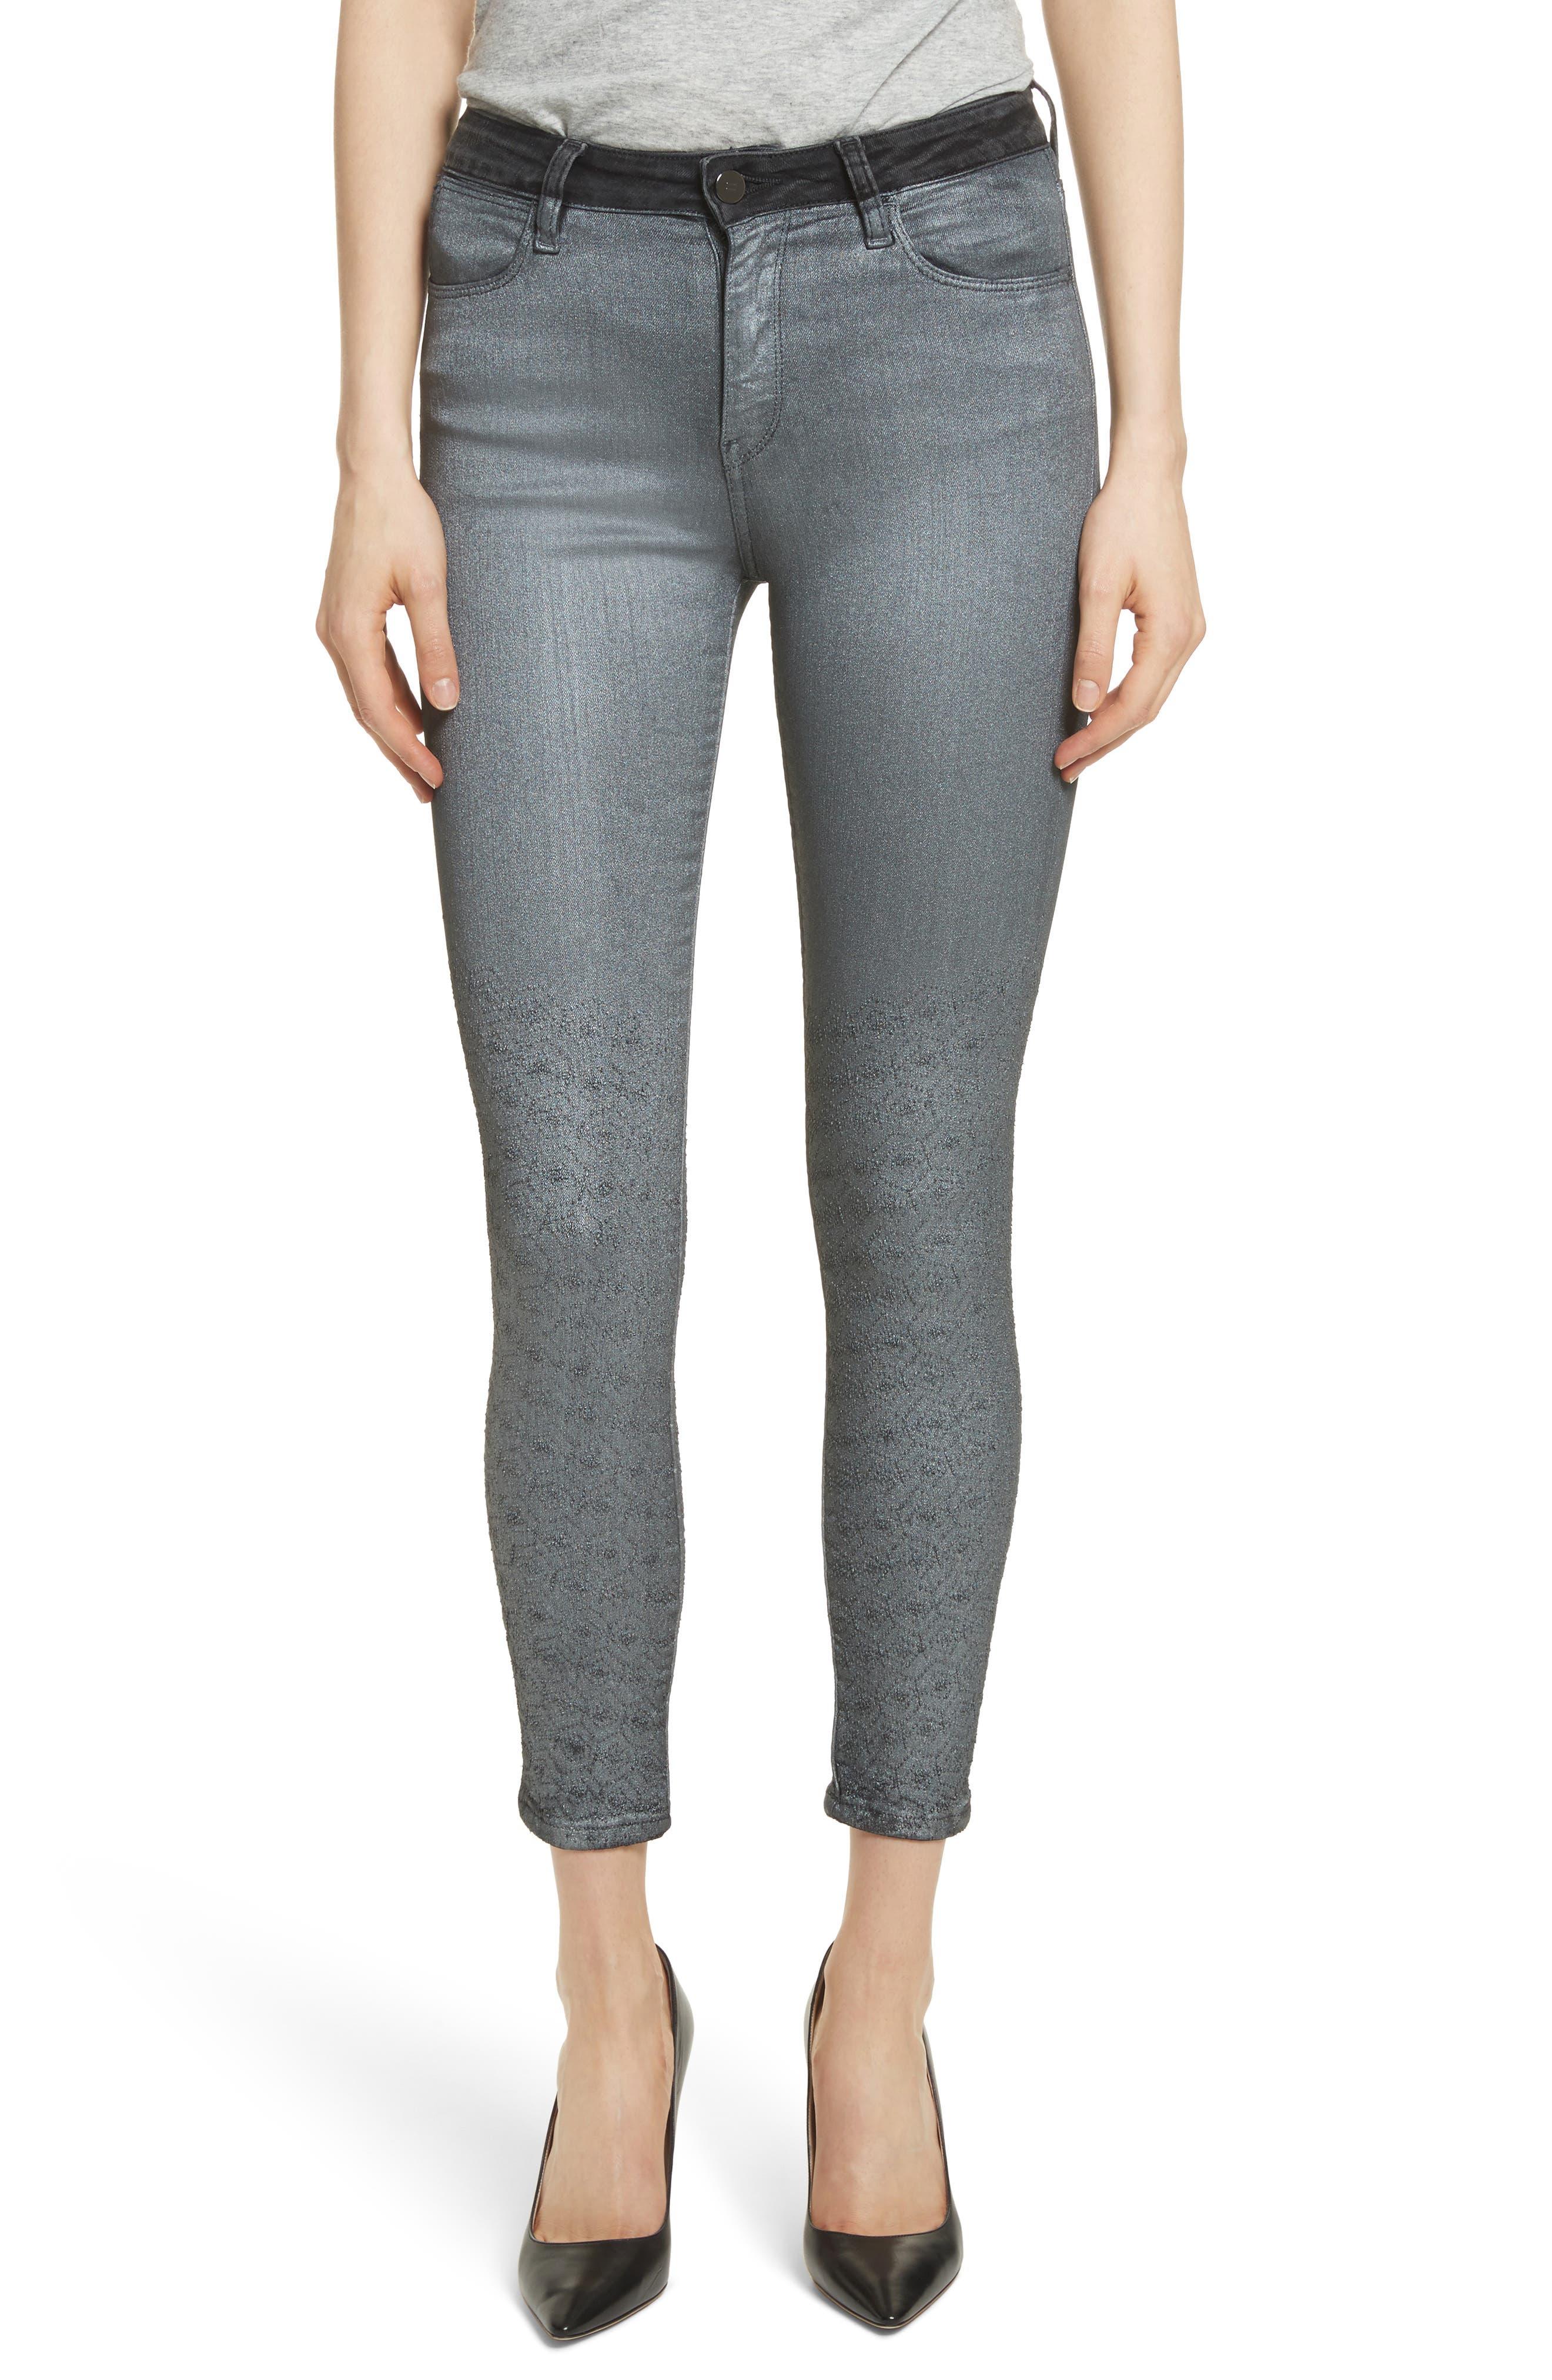 Reina Glitter Skinny Jeans,                         Main,                         color, Black Used Glitter Silver